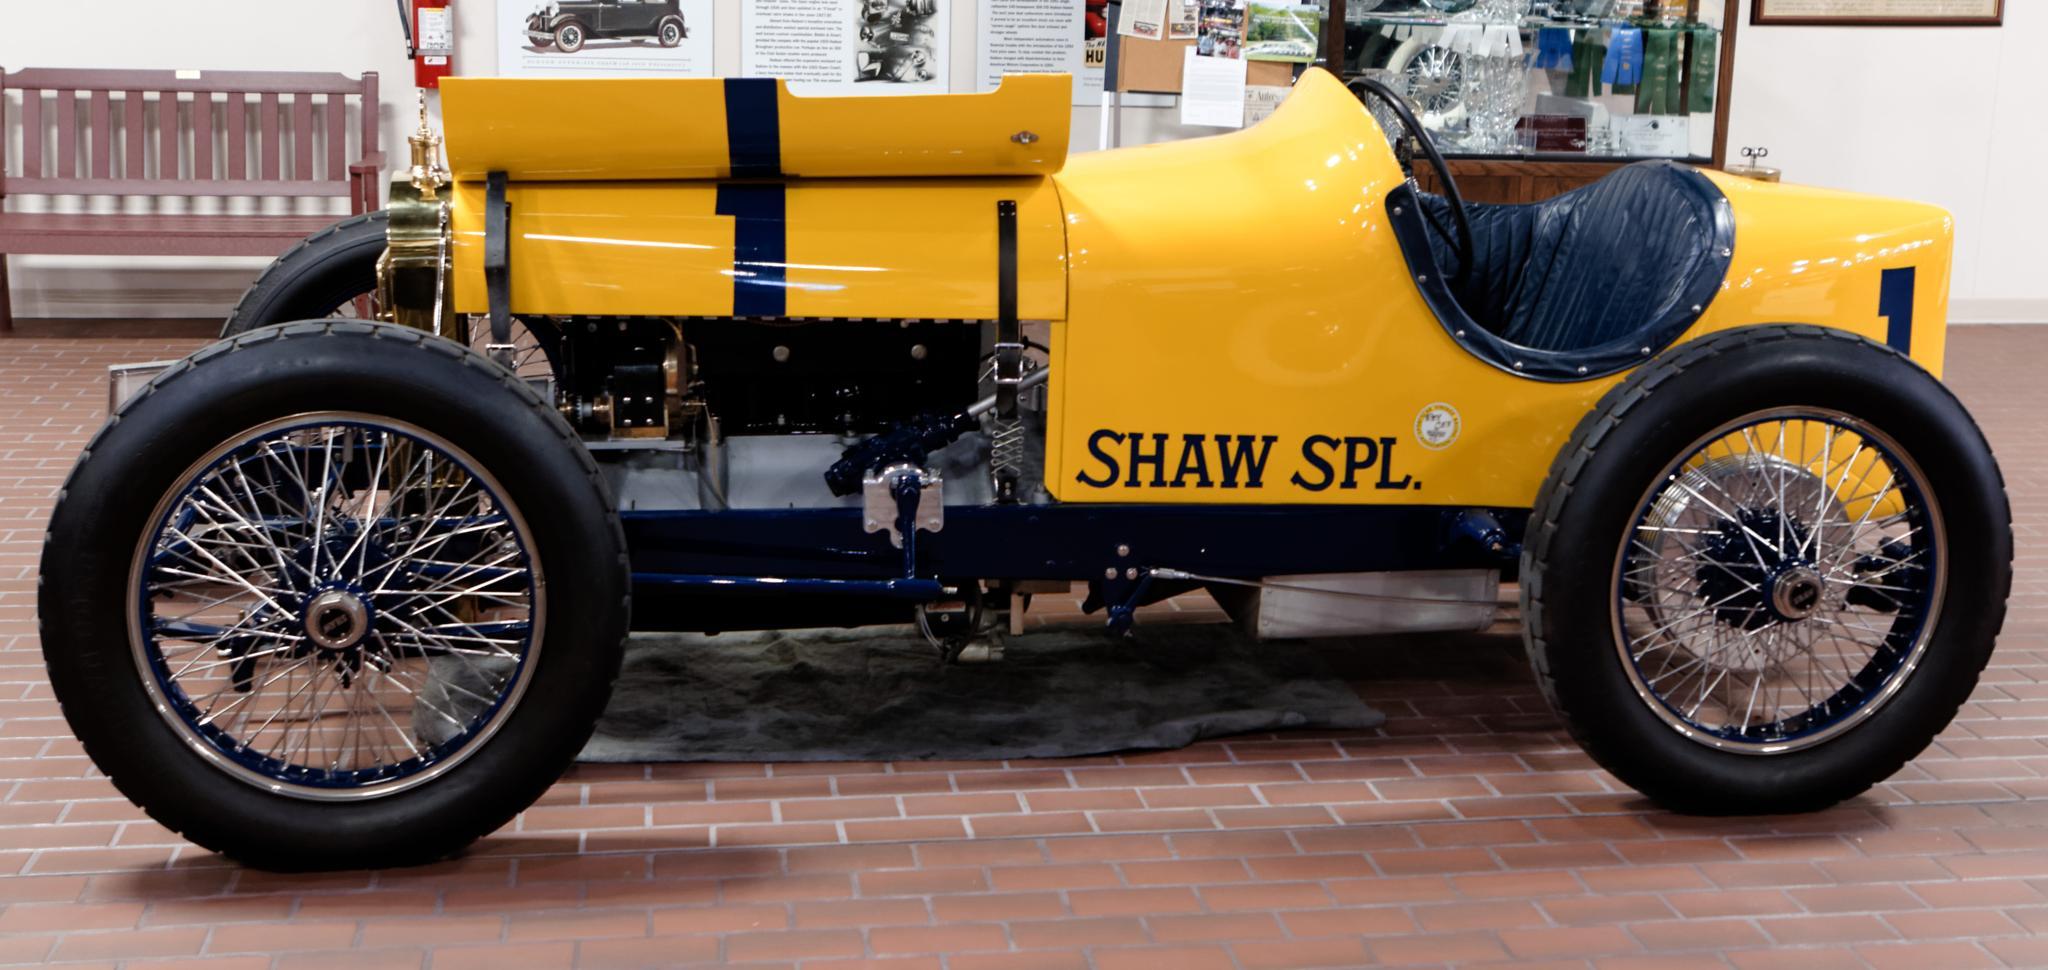 Hudson Museum Shipshewana, IN 19 by Randy Dorman